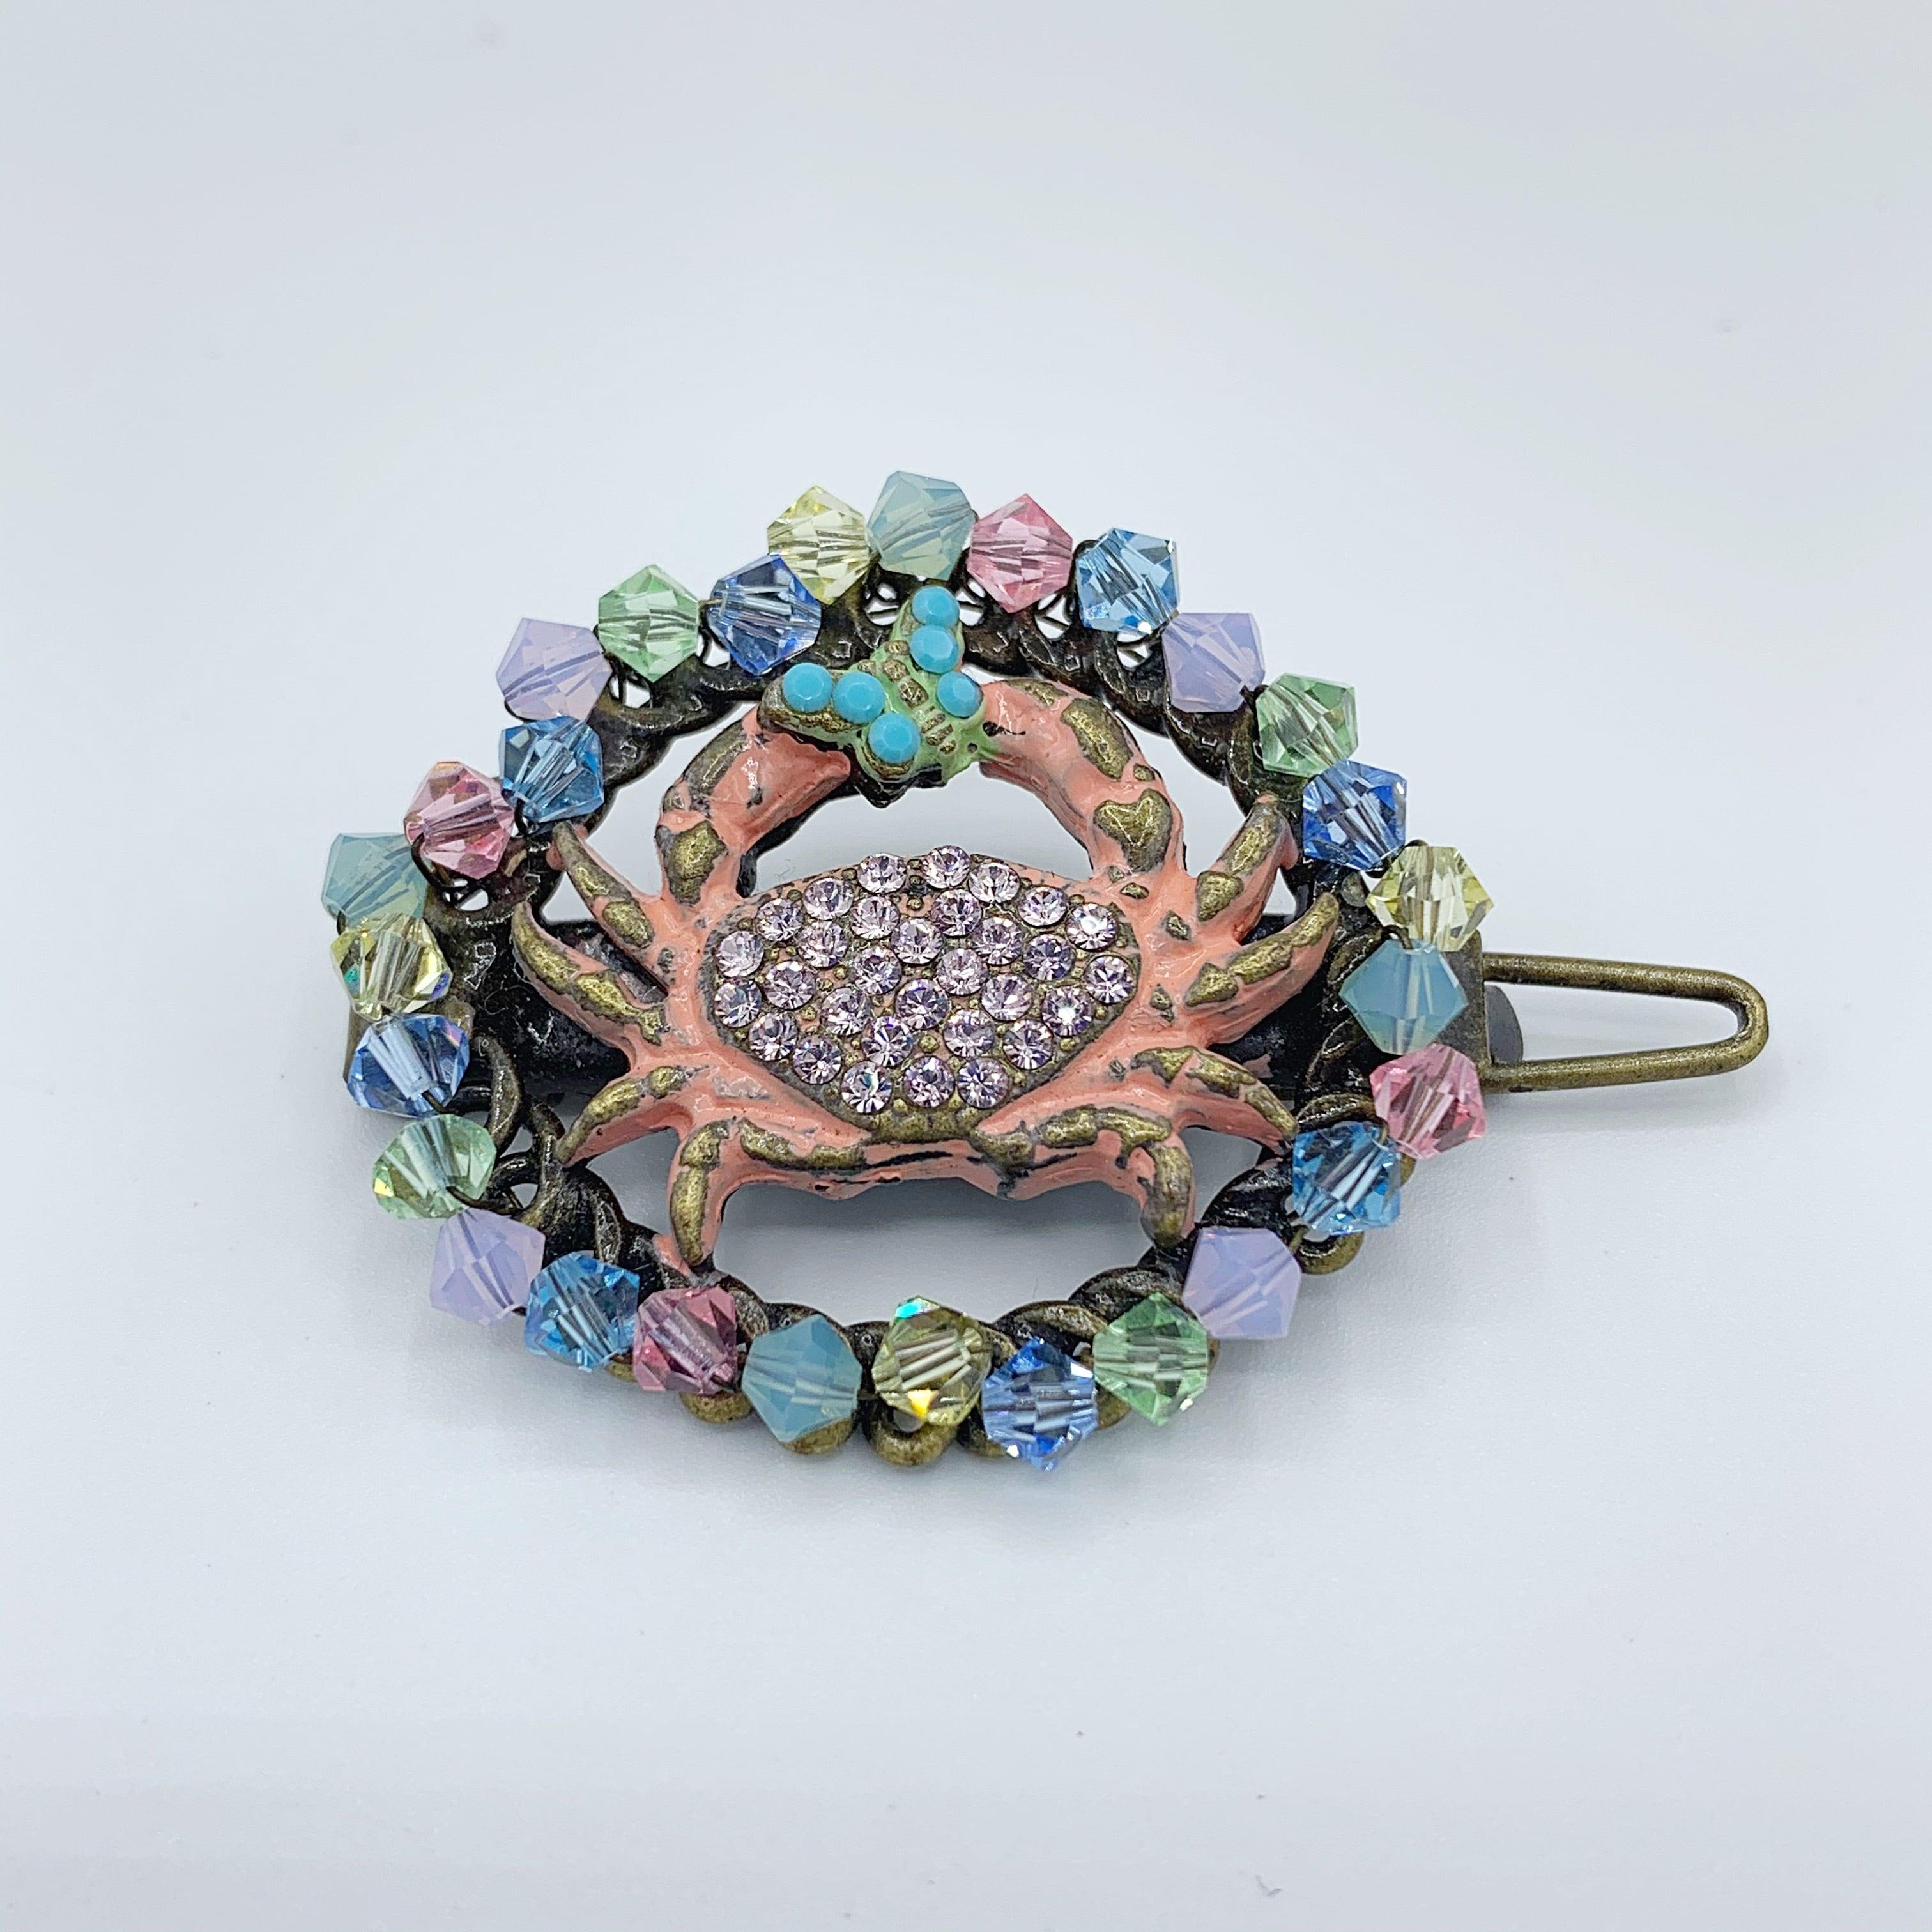 Carousel ヘアピン 蟹